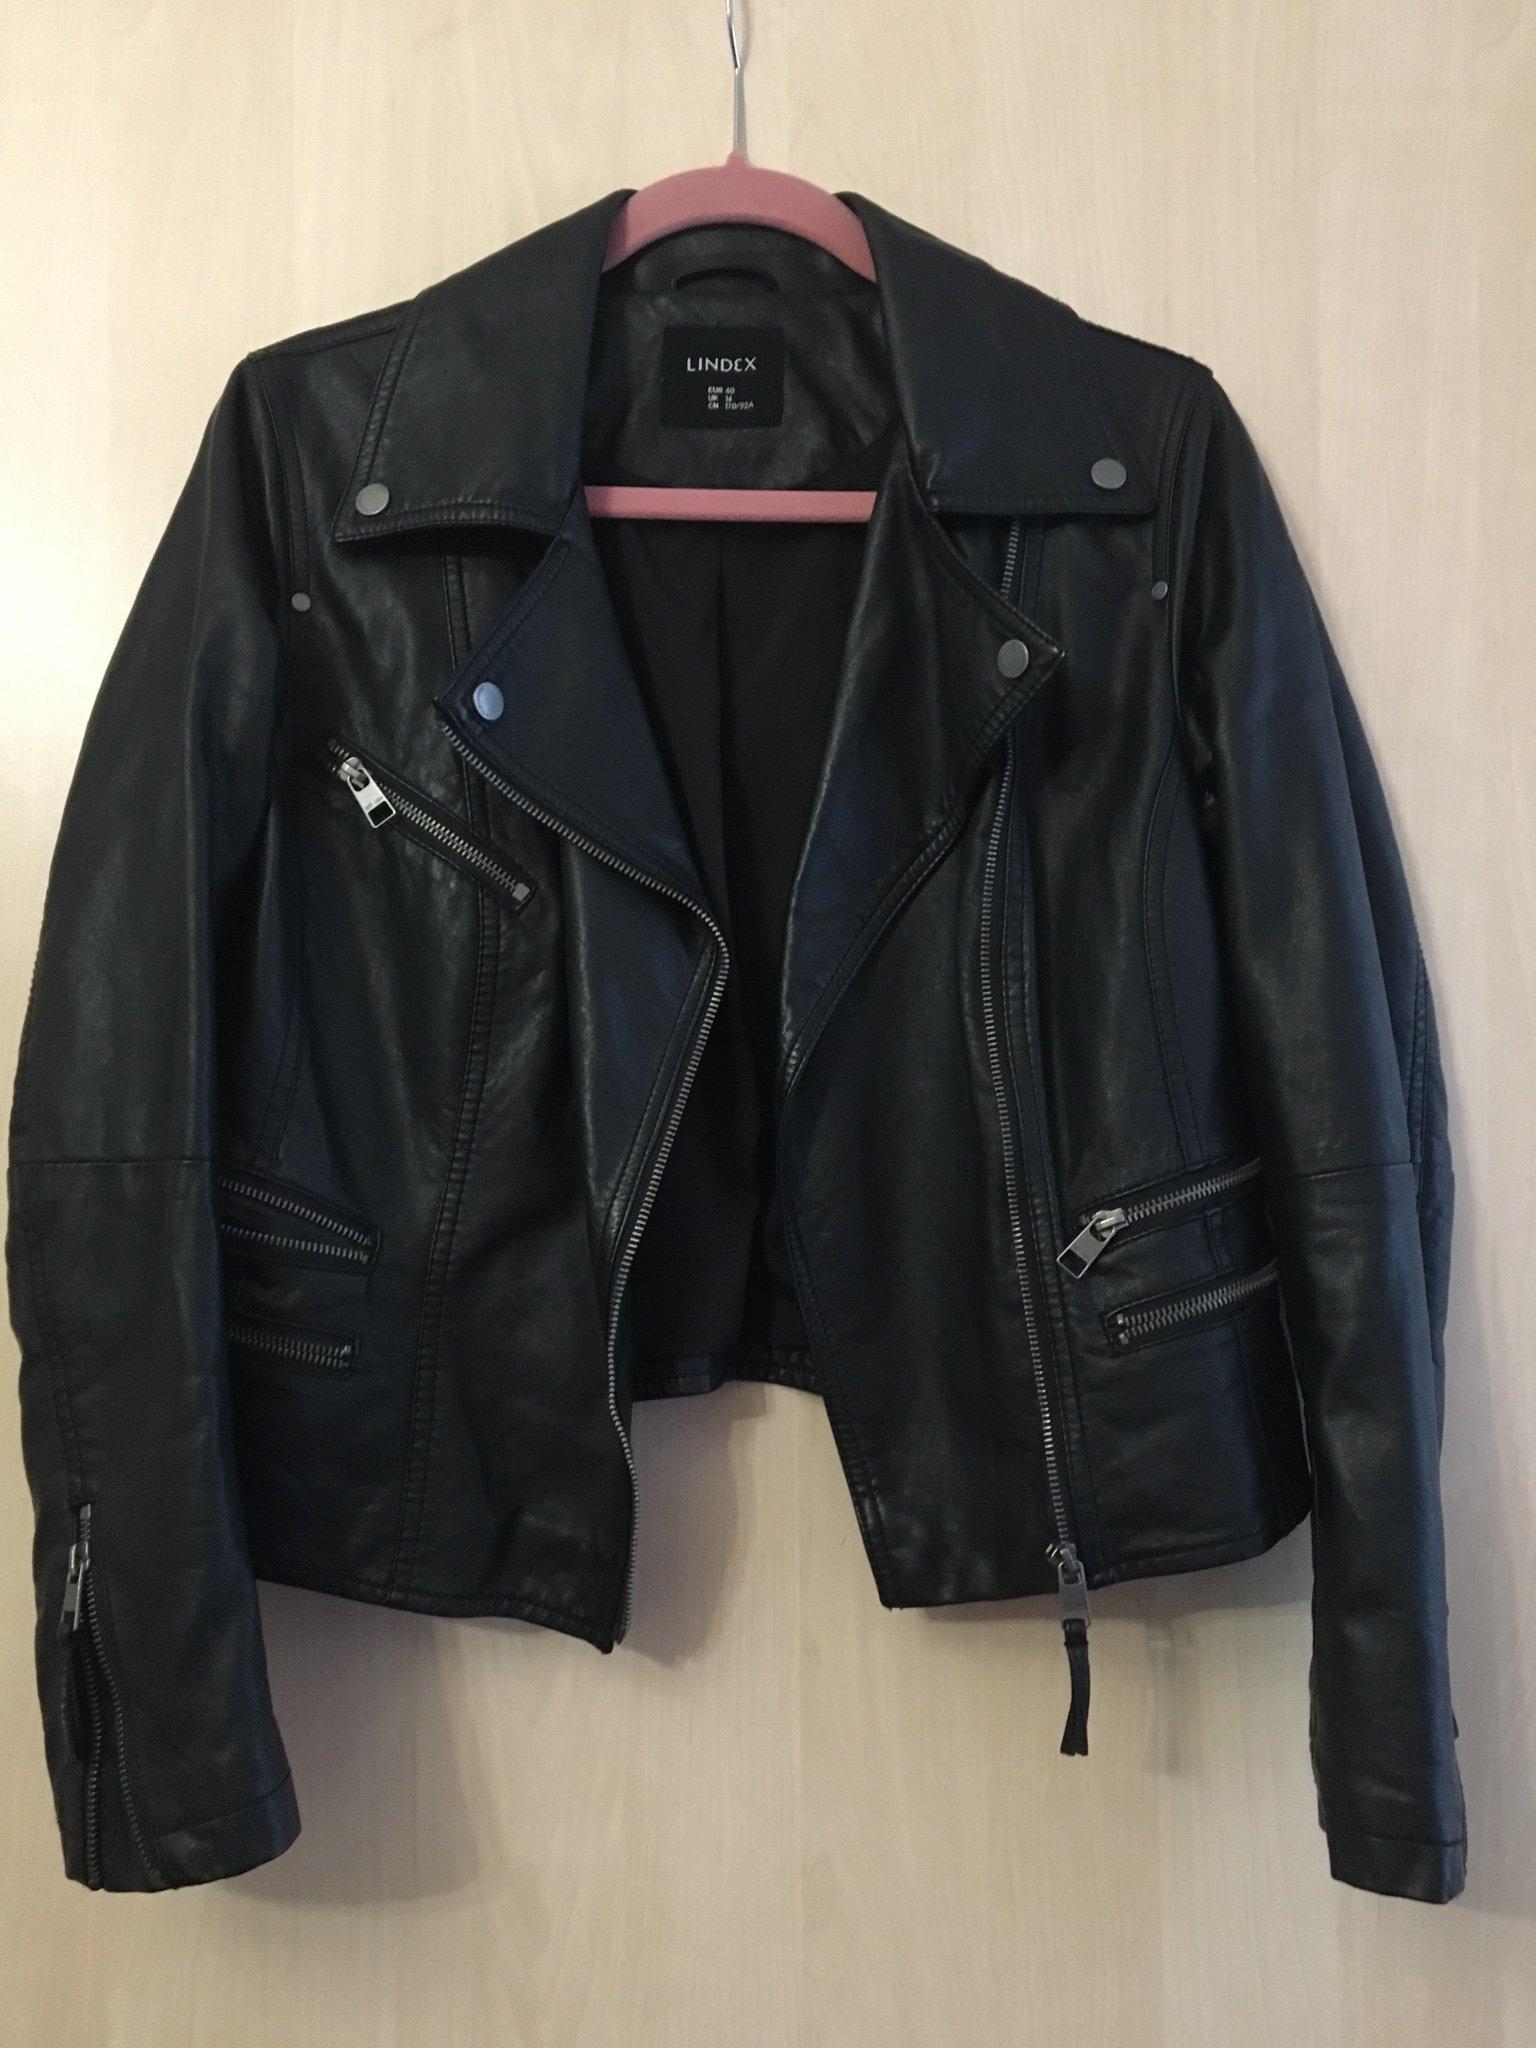 Lindex, skinnjacka i läderimitation, svart bikerjacka stl 40